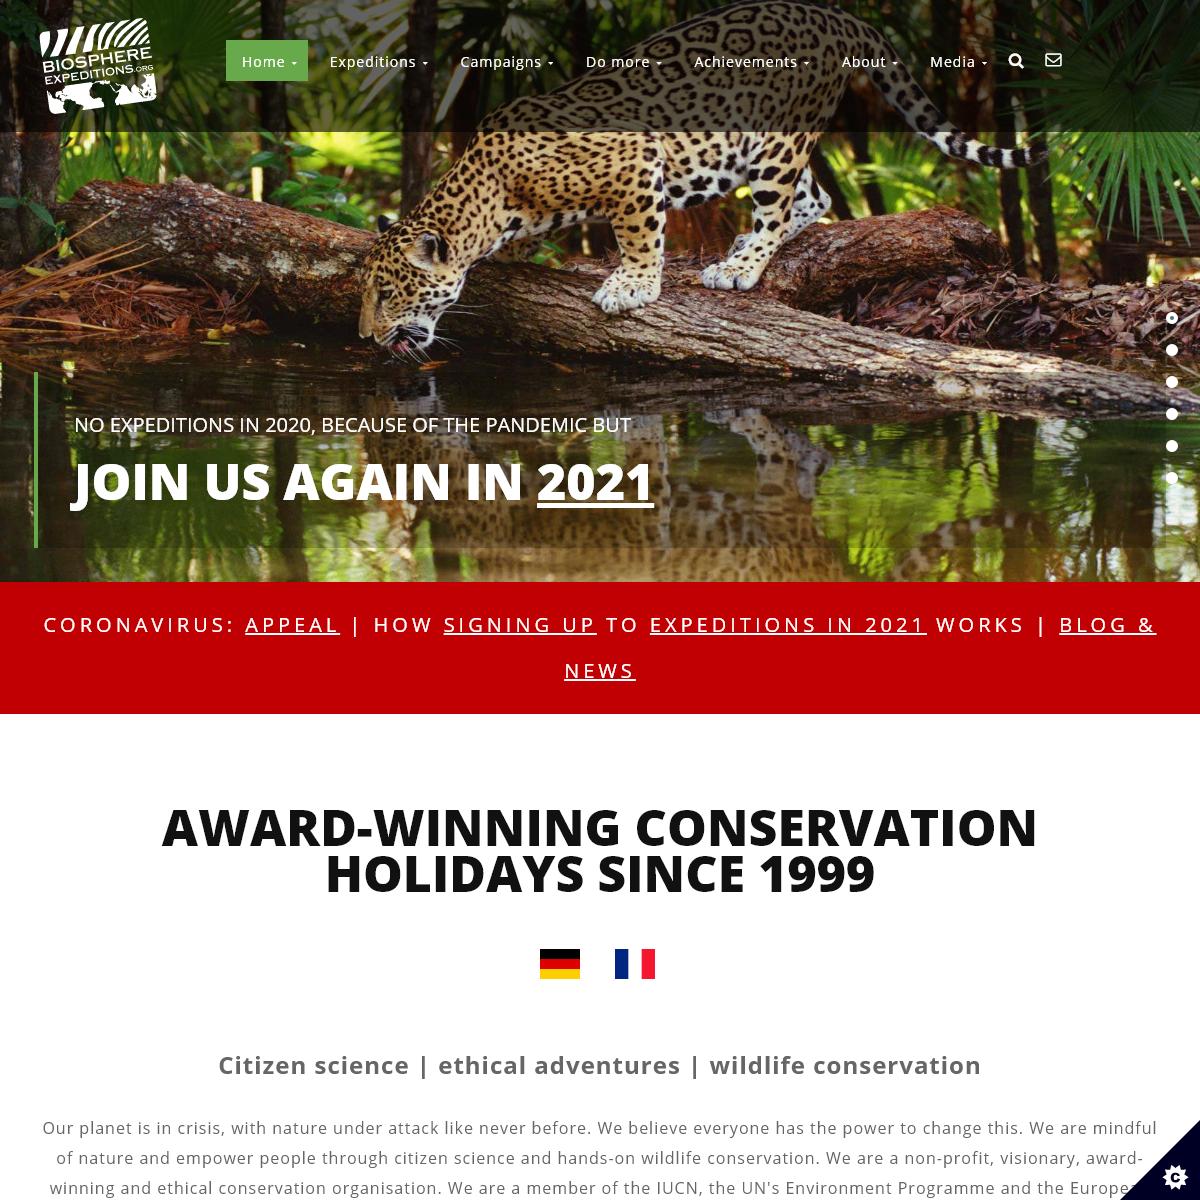 Wildlife conservation volunteer holidays - Biosphere Expeditions